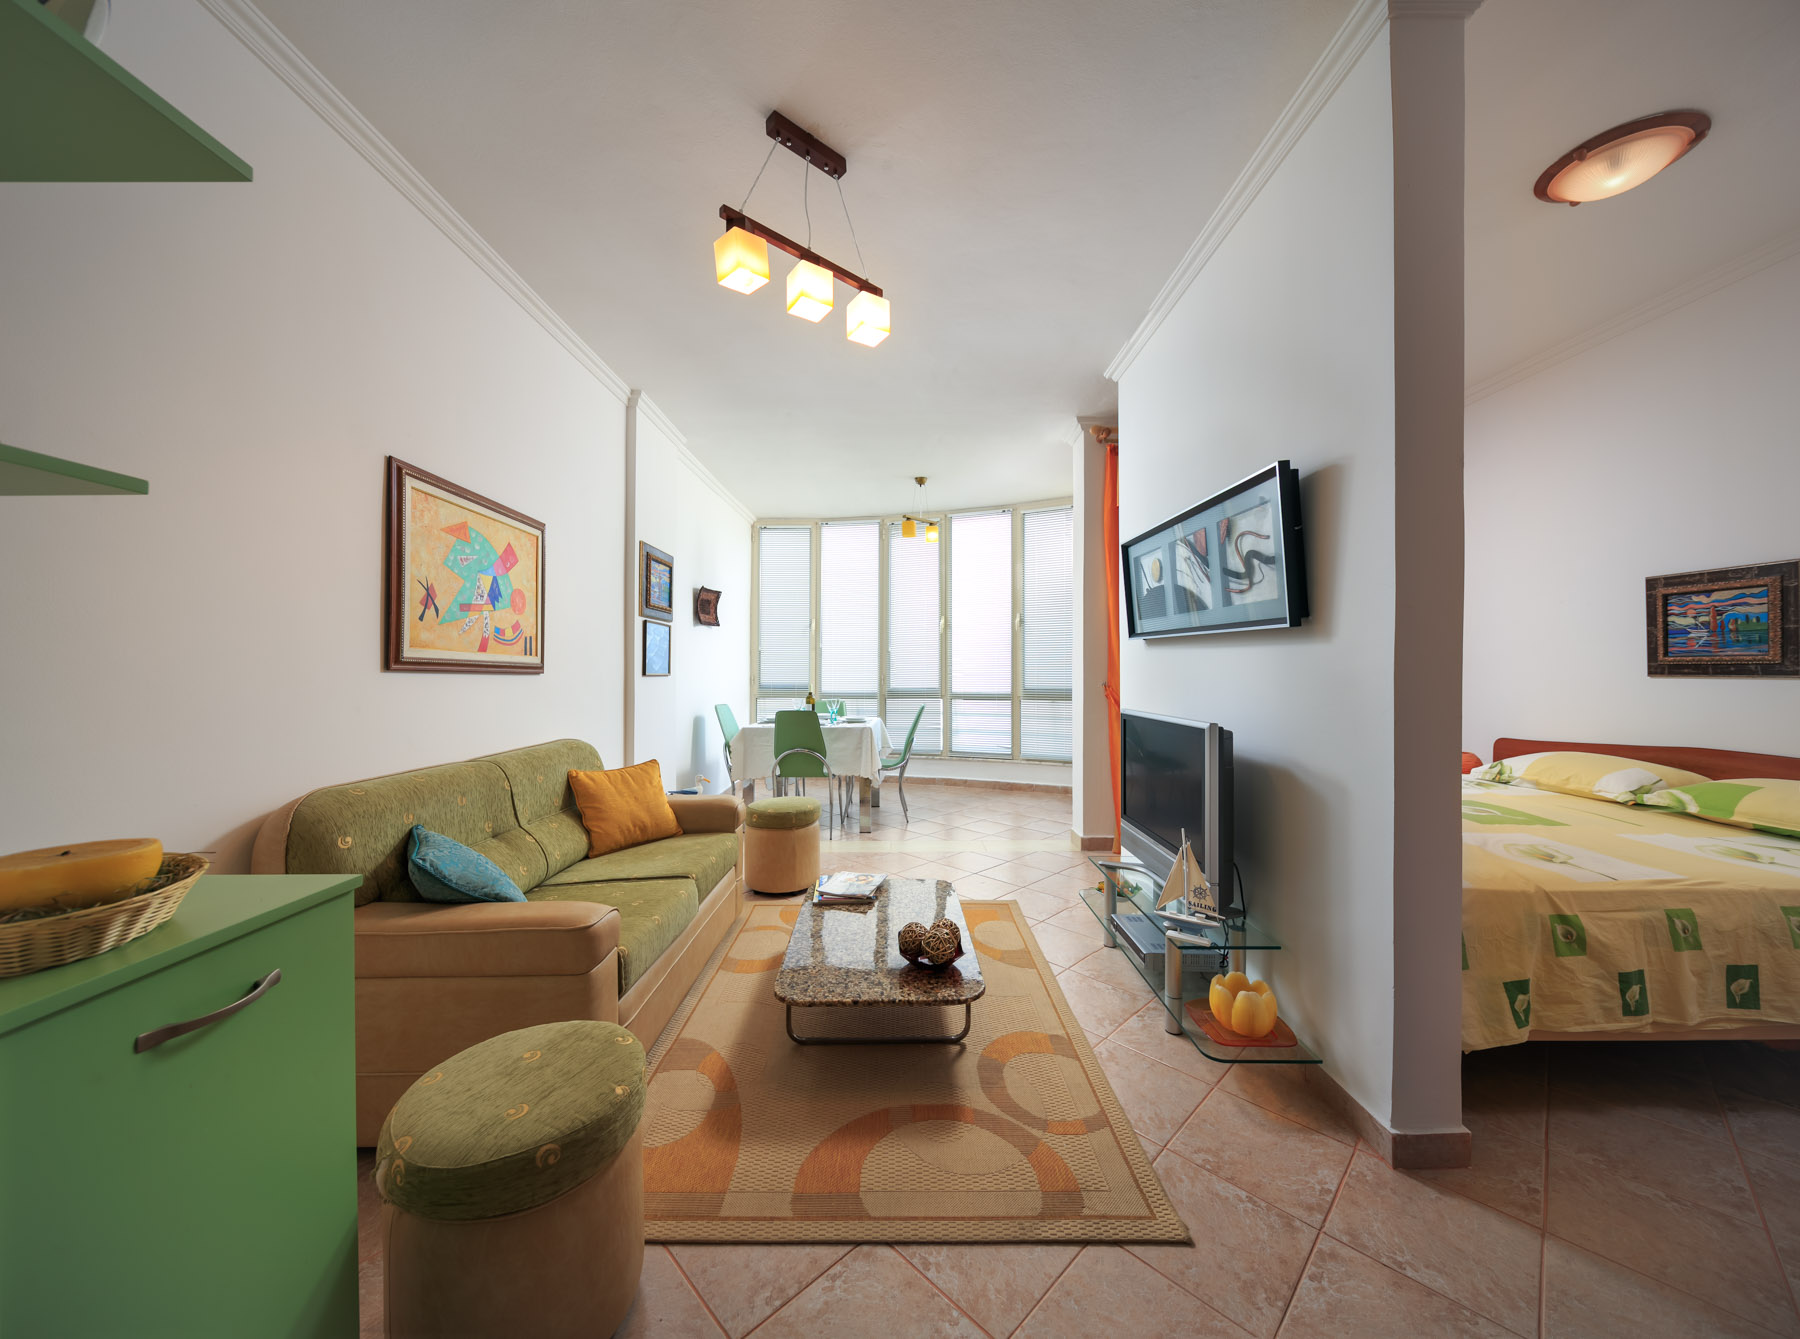 Apartament ne shitje, Okazion Ideal per Pushim,Perfshihet ne cmim arredim mobilim modern ,garazhdi si dhe disponohet dokumentacion i rregull, Cmimi 26700 a,! (Okazion)